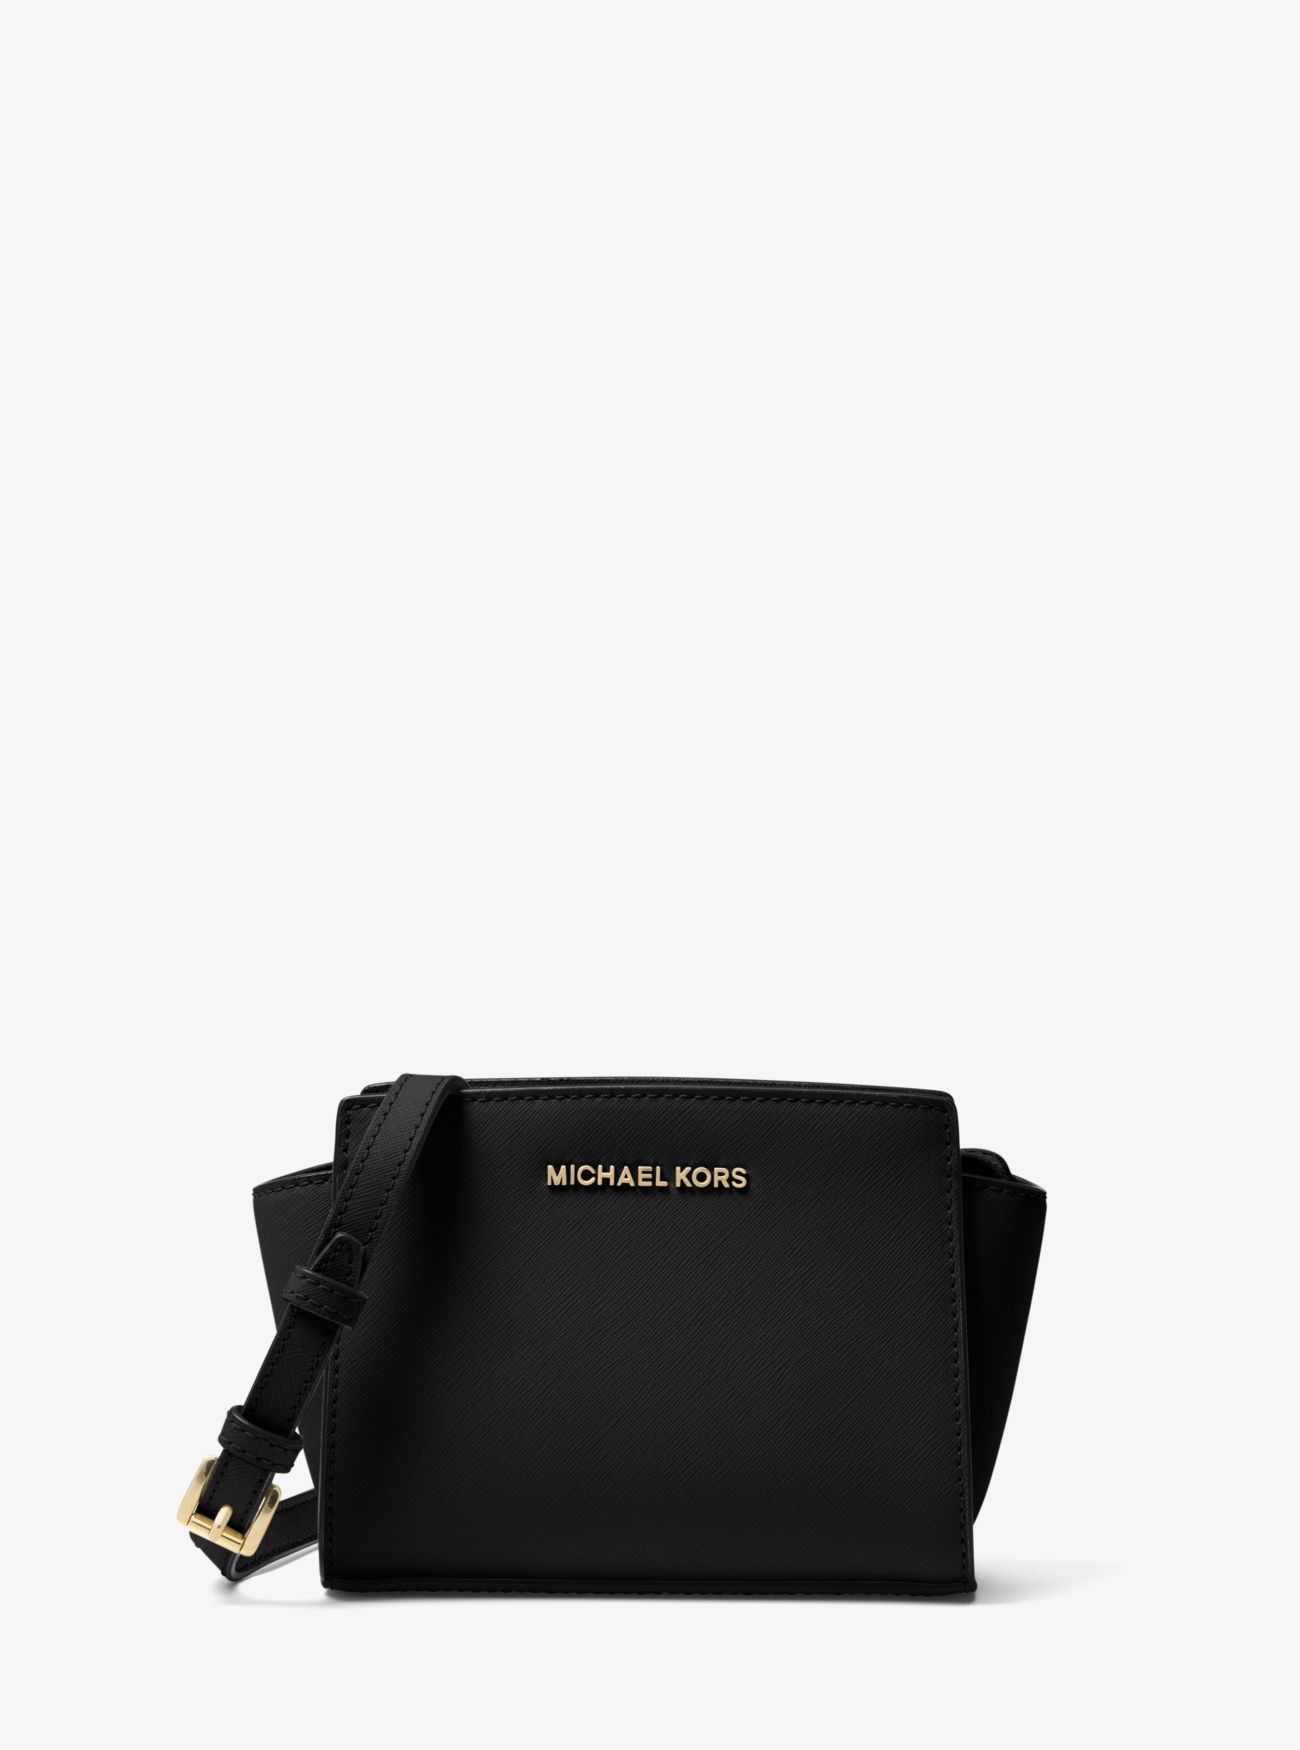 e6b2dfc6c6e5 Price Michael Kors Black Selma Mini Saffiano Leather Crossbody Outlet Sale